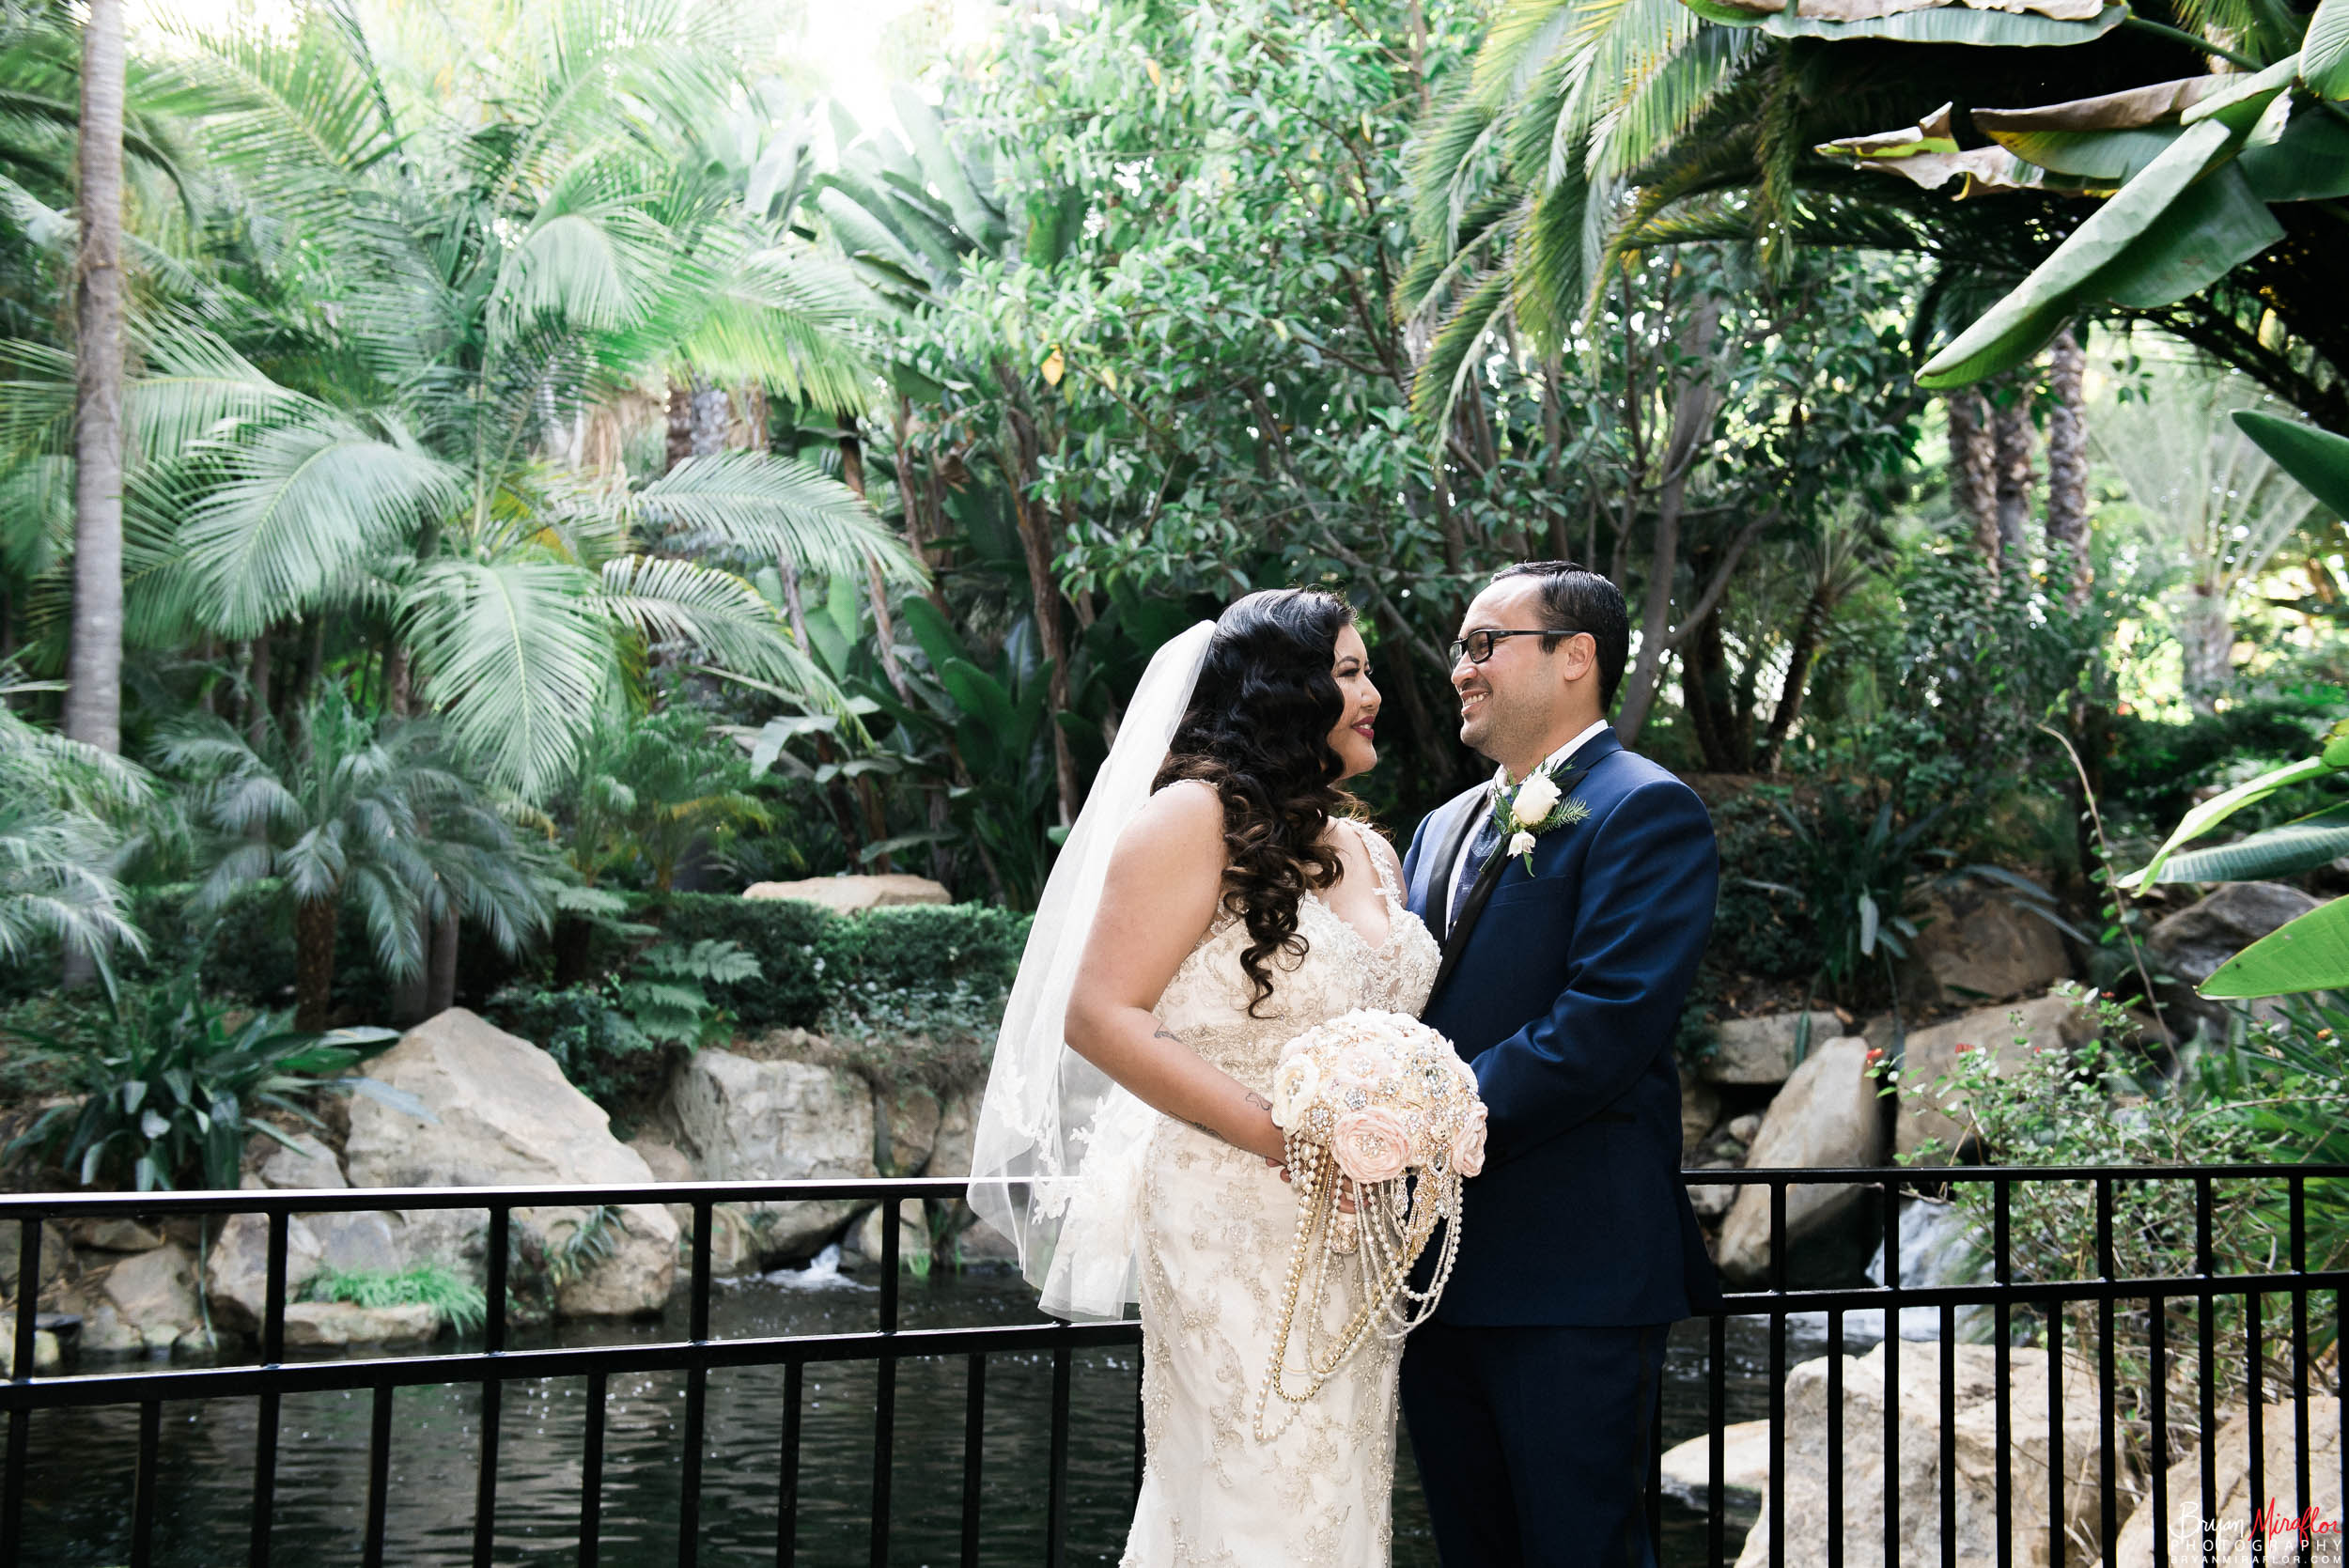 Bryan-Miraflor-Photography-Hannah-Jonathan-Married-Grand-Traditions-Estate-Gardens-Fallbrook-20171222-003.jpg